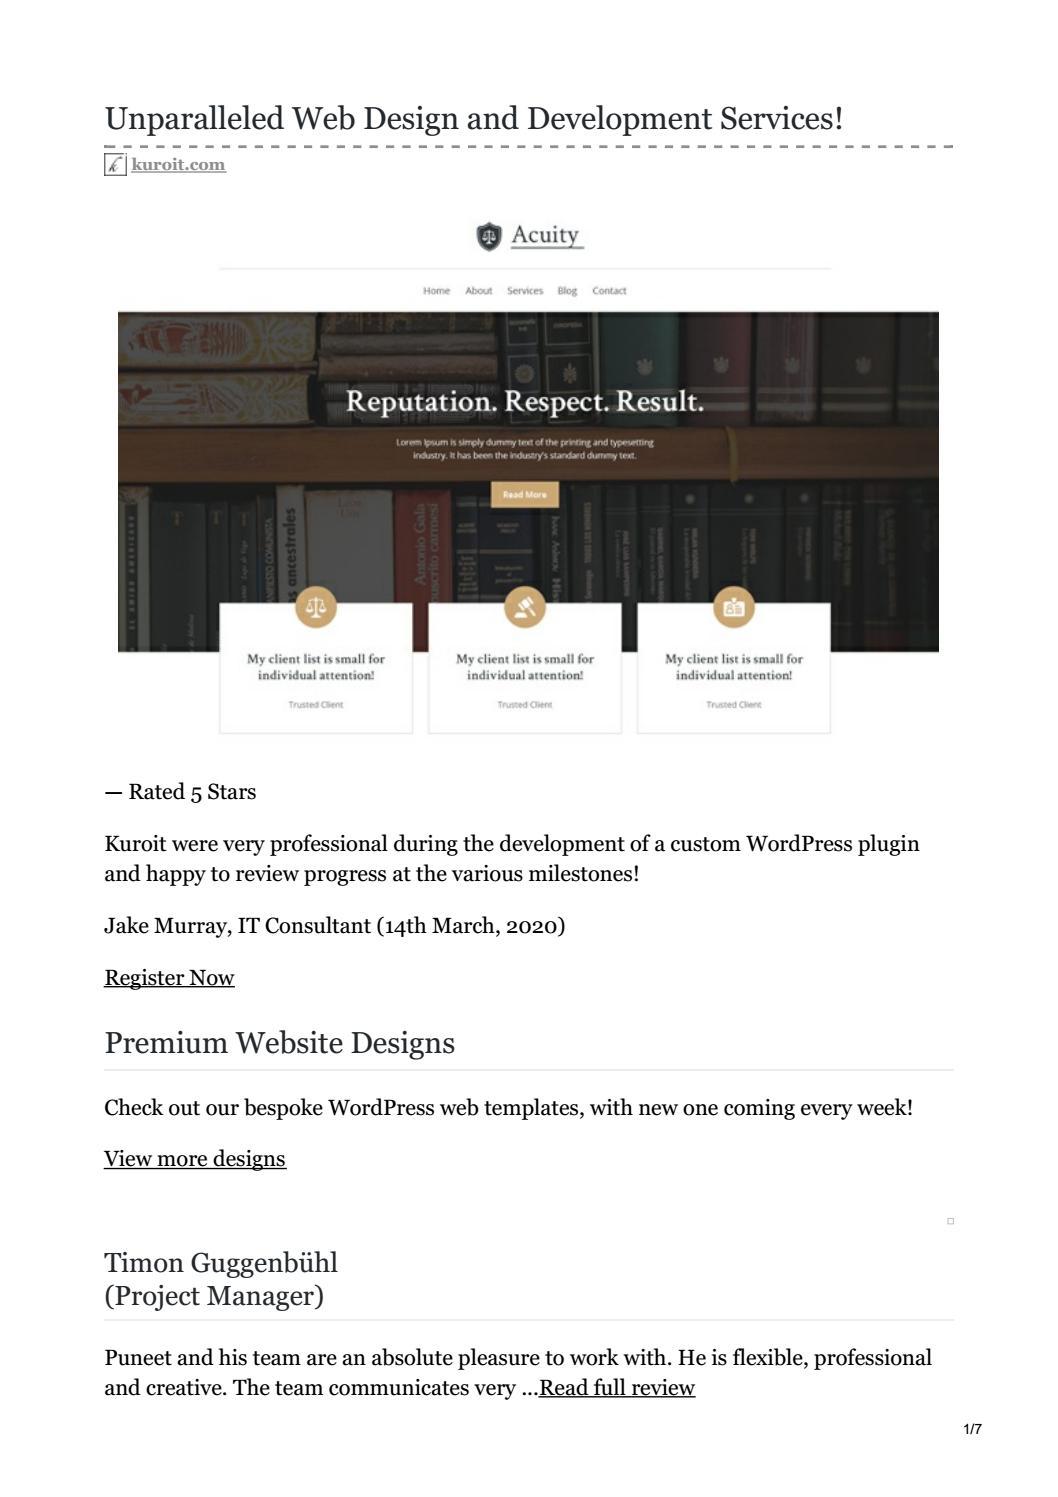 Web Design And Development Agency In London Kuroit By Tapaswini Dash Issuu